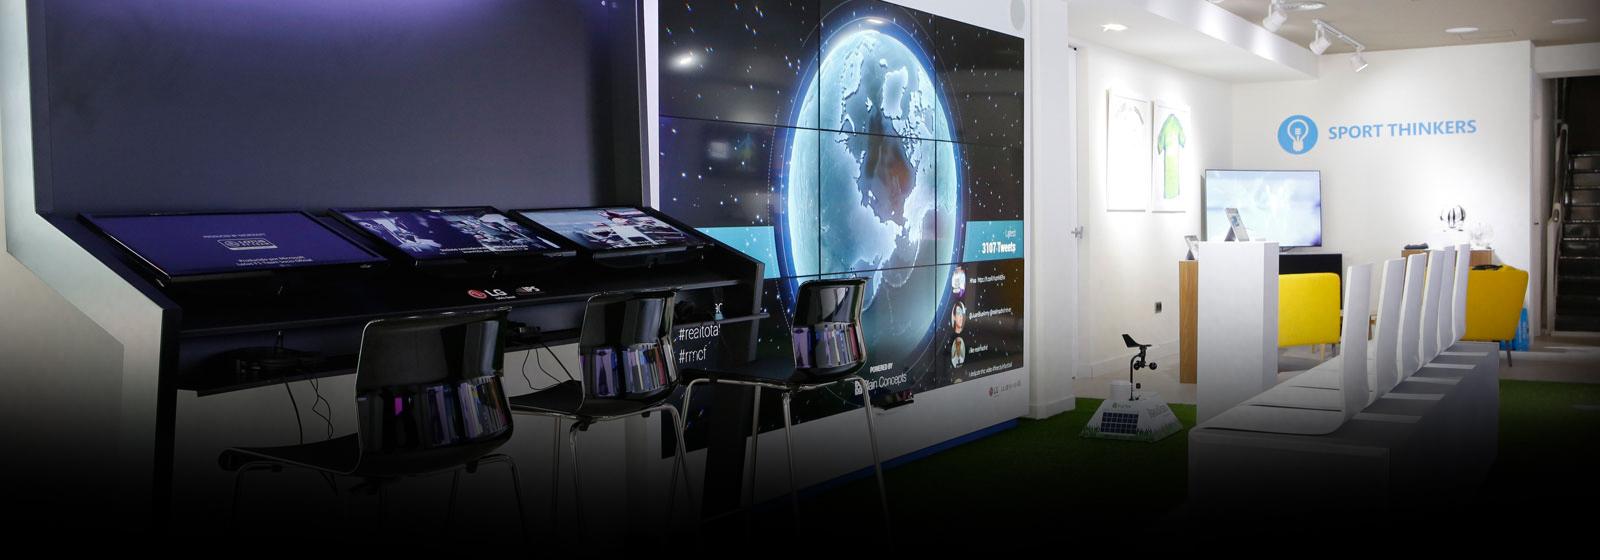 Centro de Innovación: Visita el Global Sports Innovation Center